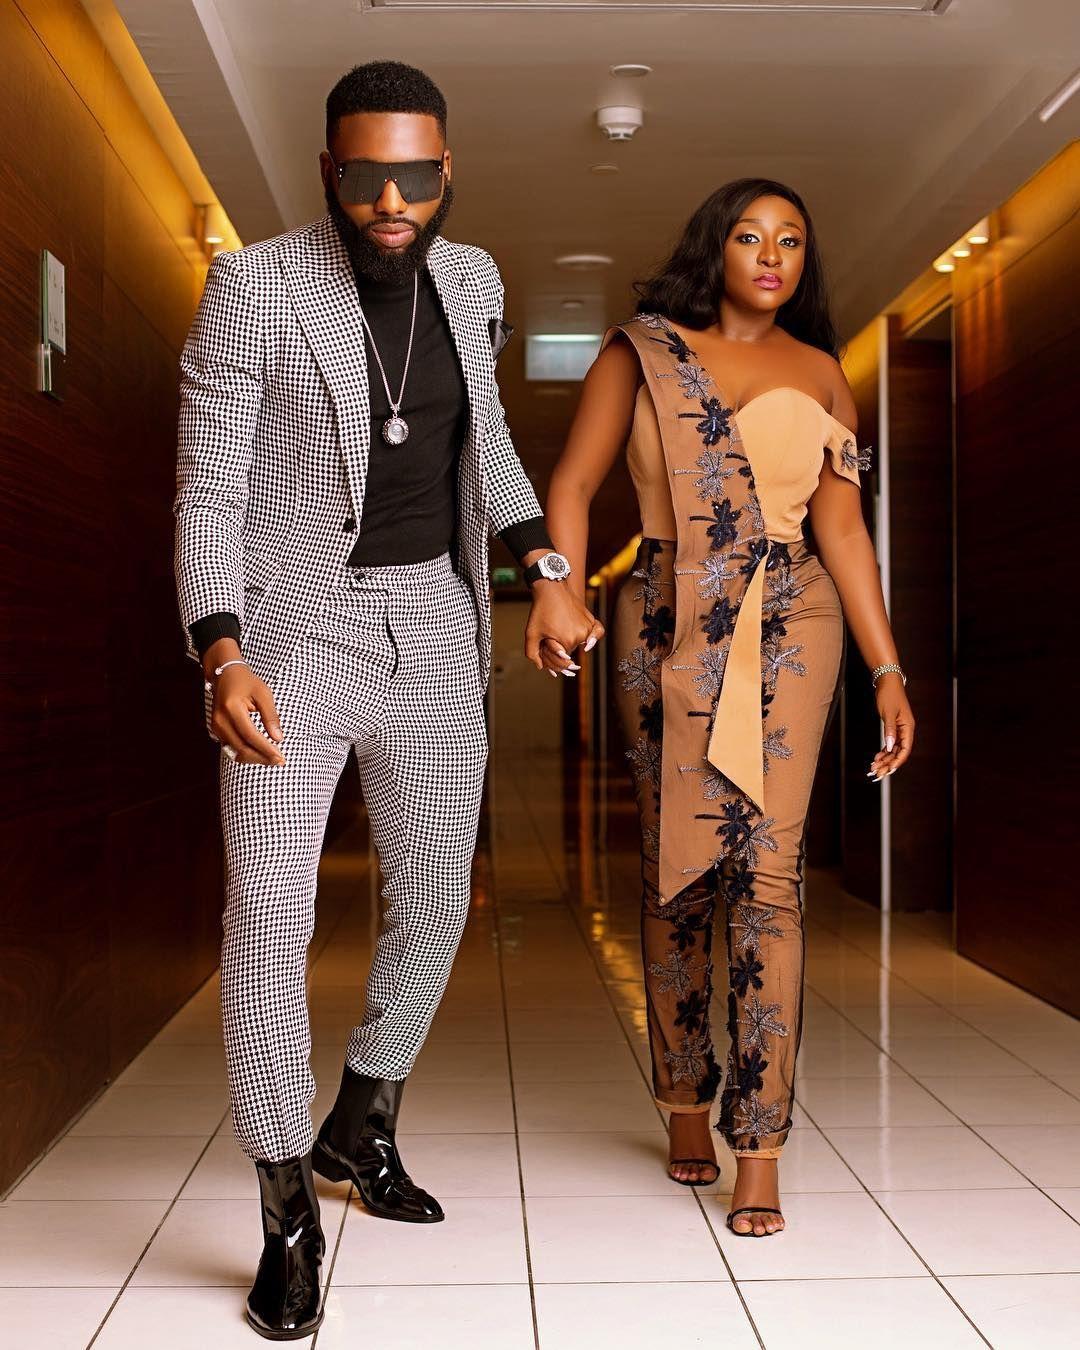 Ini Edo And Swanky Jerry Step Out In Style Celebrities Nigeria Registry Wedding Dress Naija Fashion Style